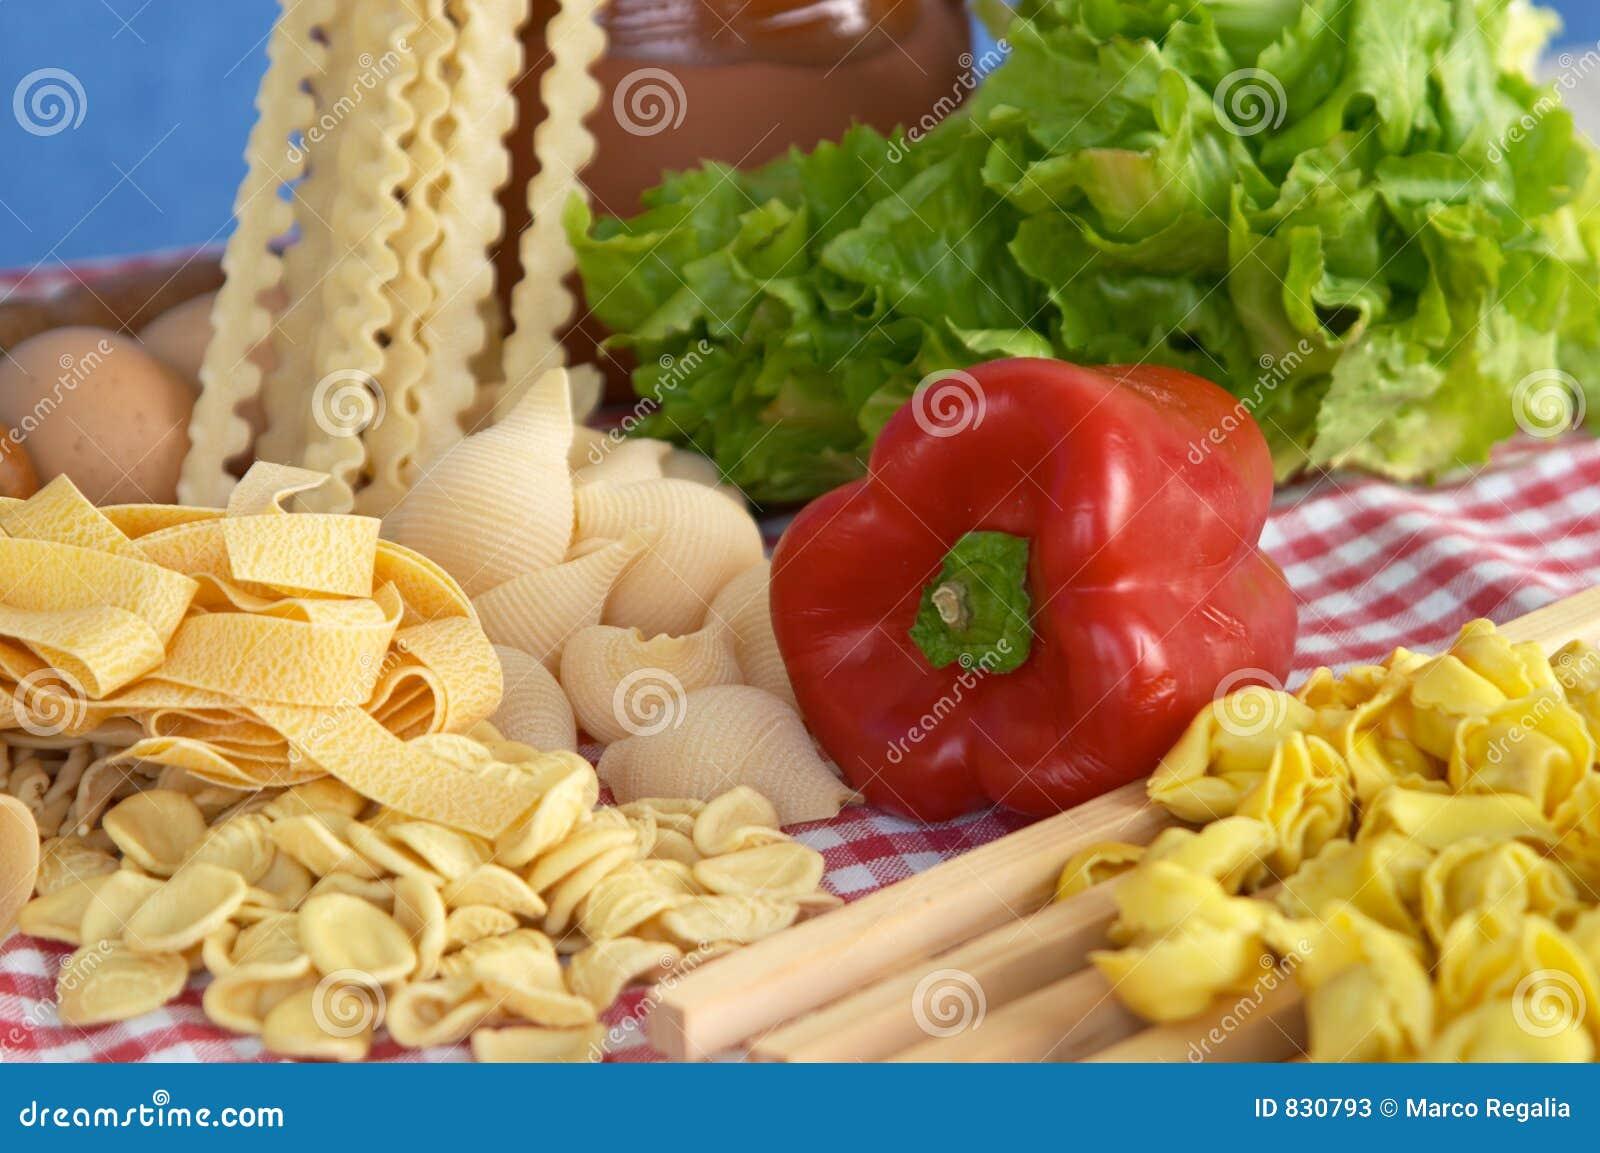 Pasta, vegetables, egg